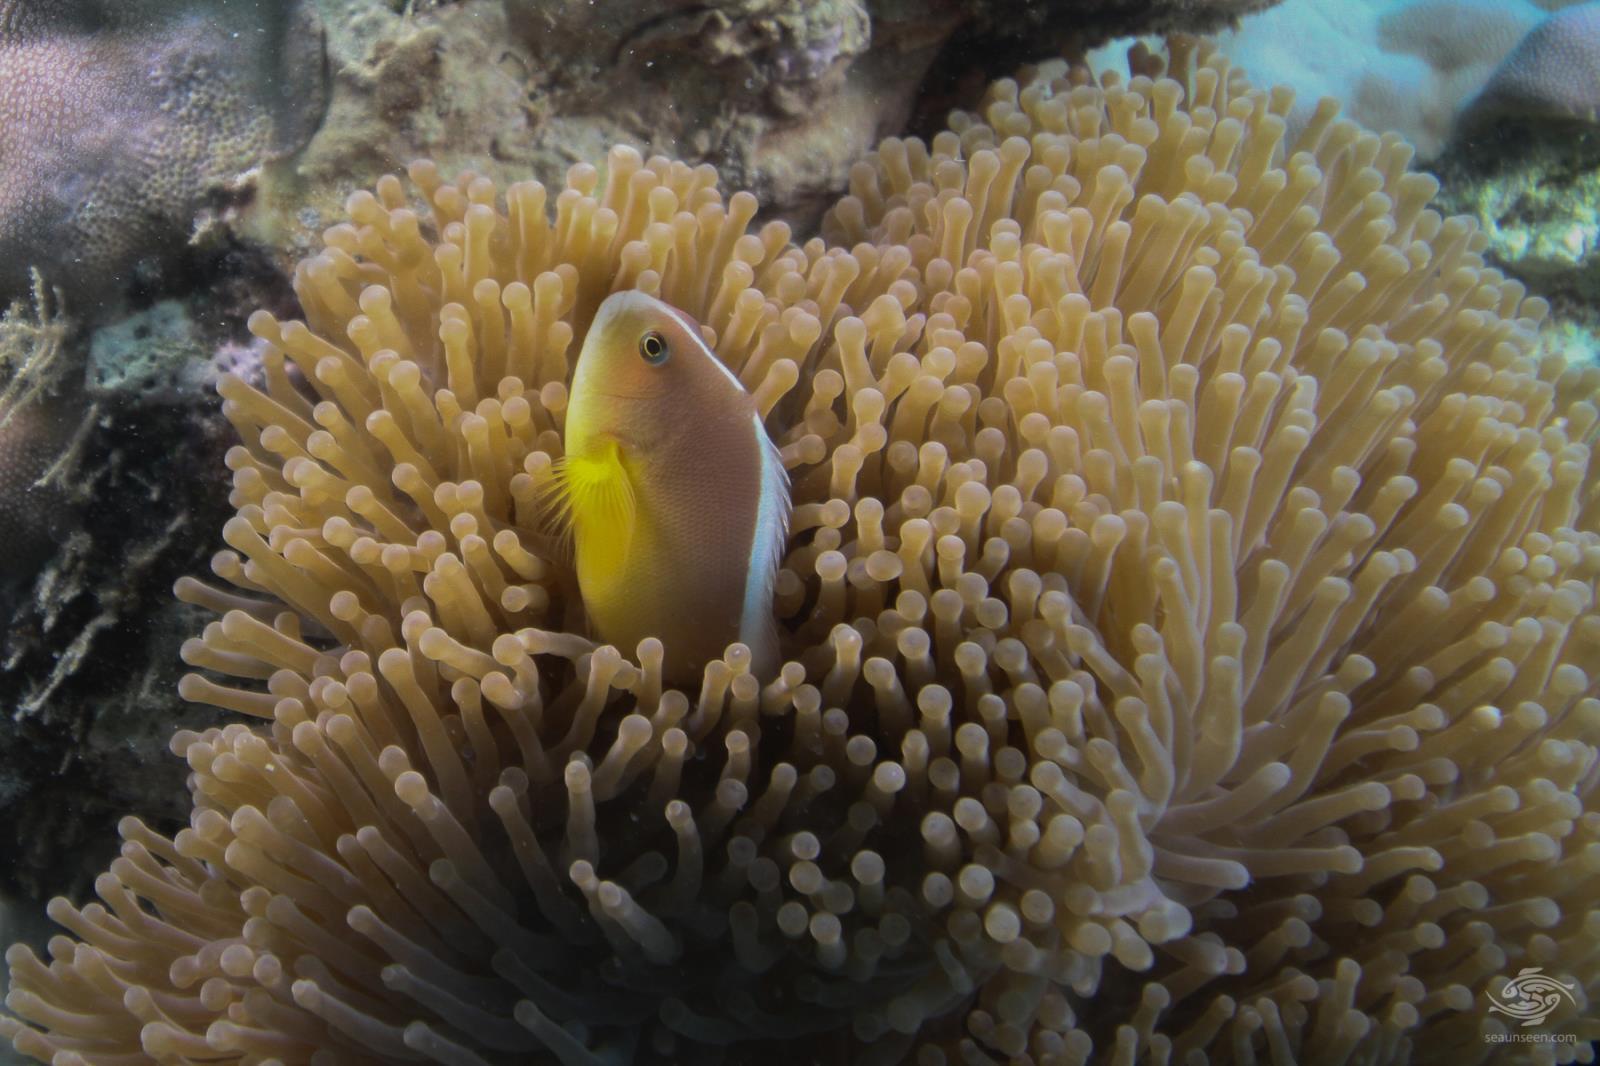 magnificent anemone, Heteractis magnifica Tanzania diving7